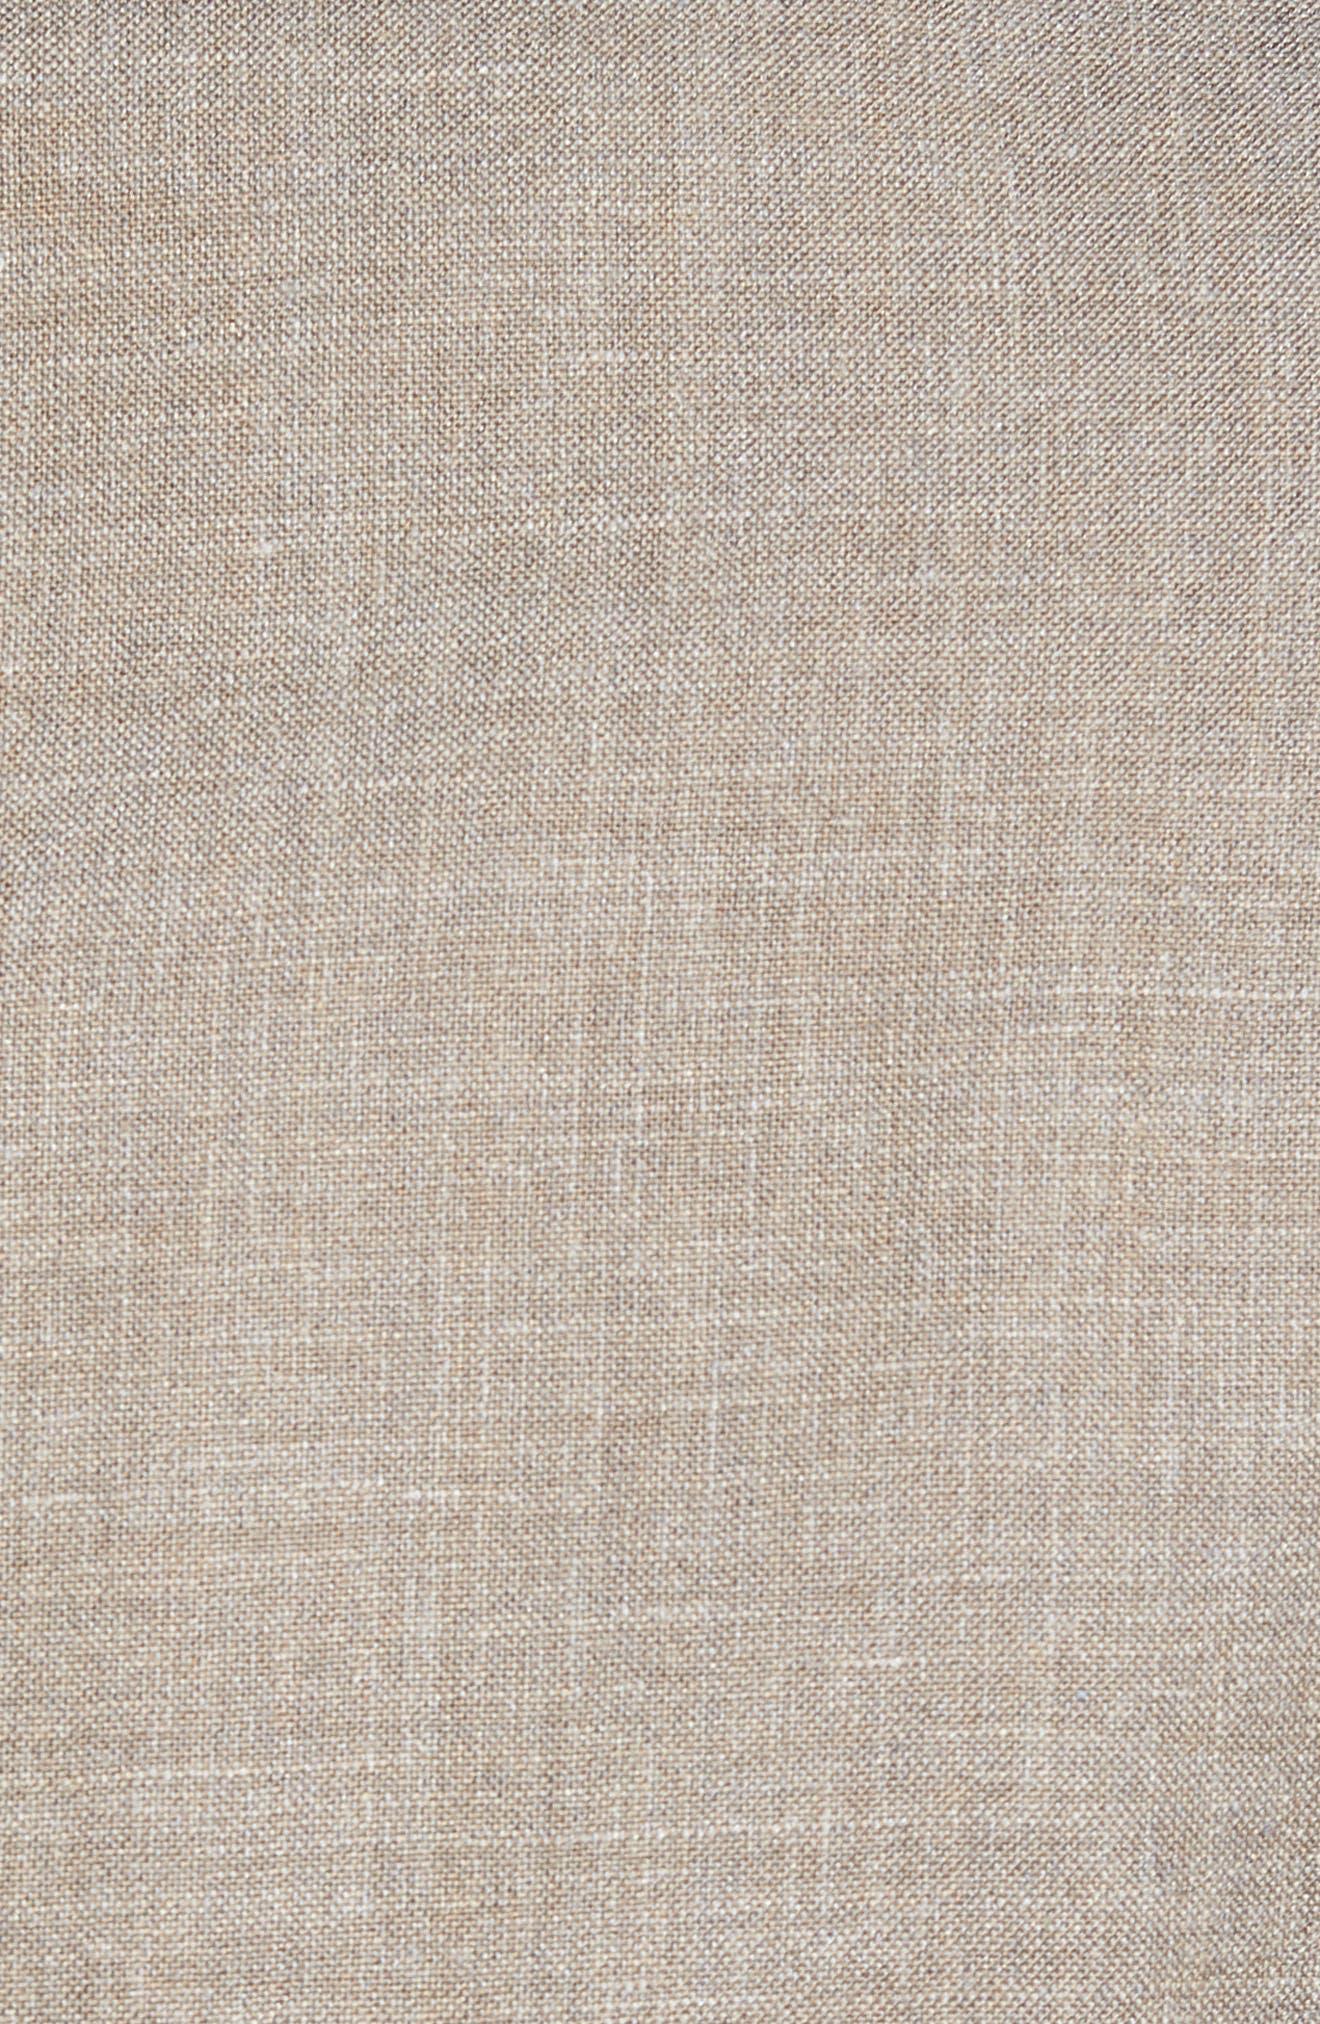 Trim Fit Wool Blend Blazer,                             Alternate thumbnail 5, color,                             Tan